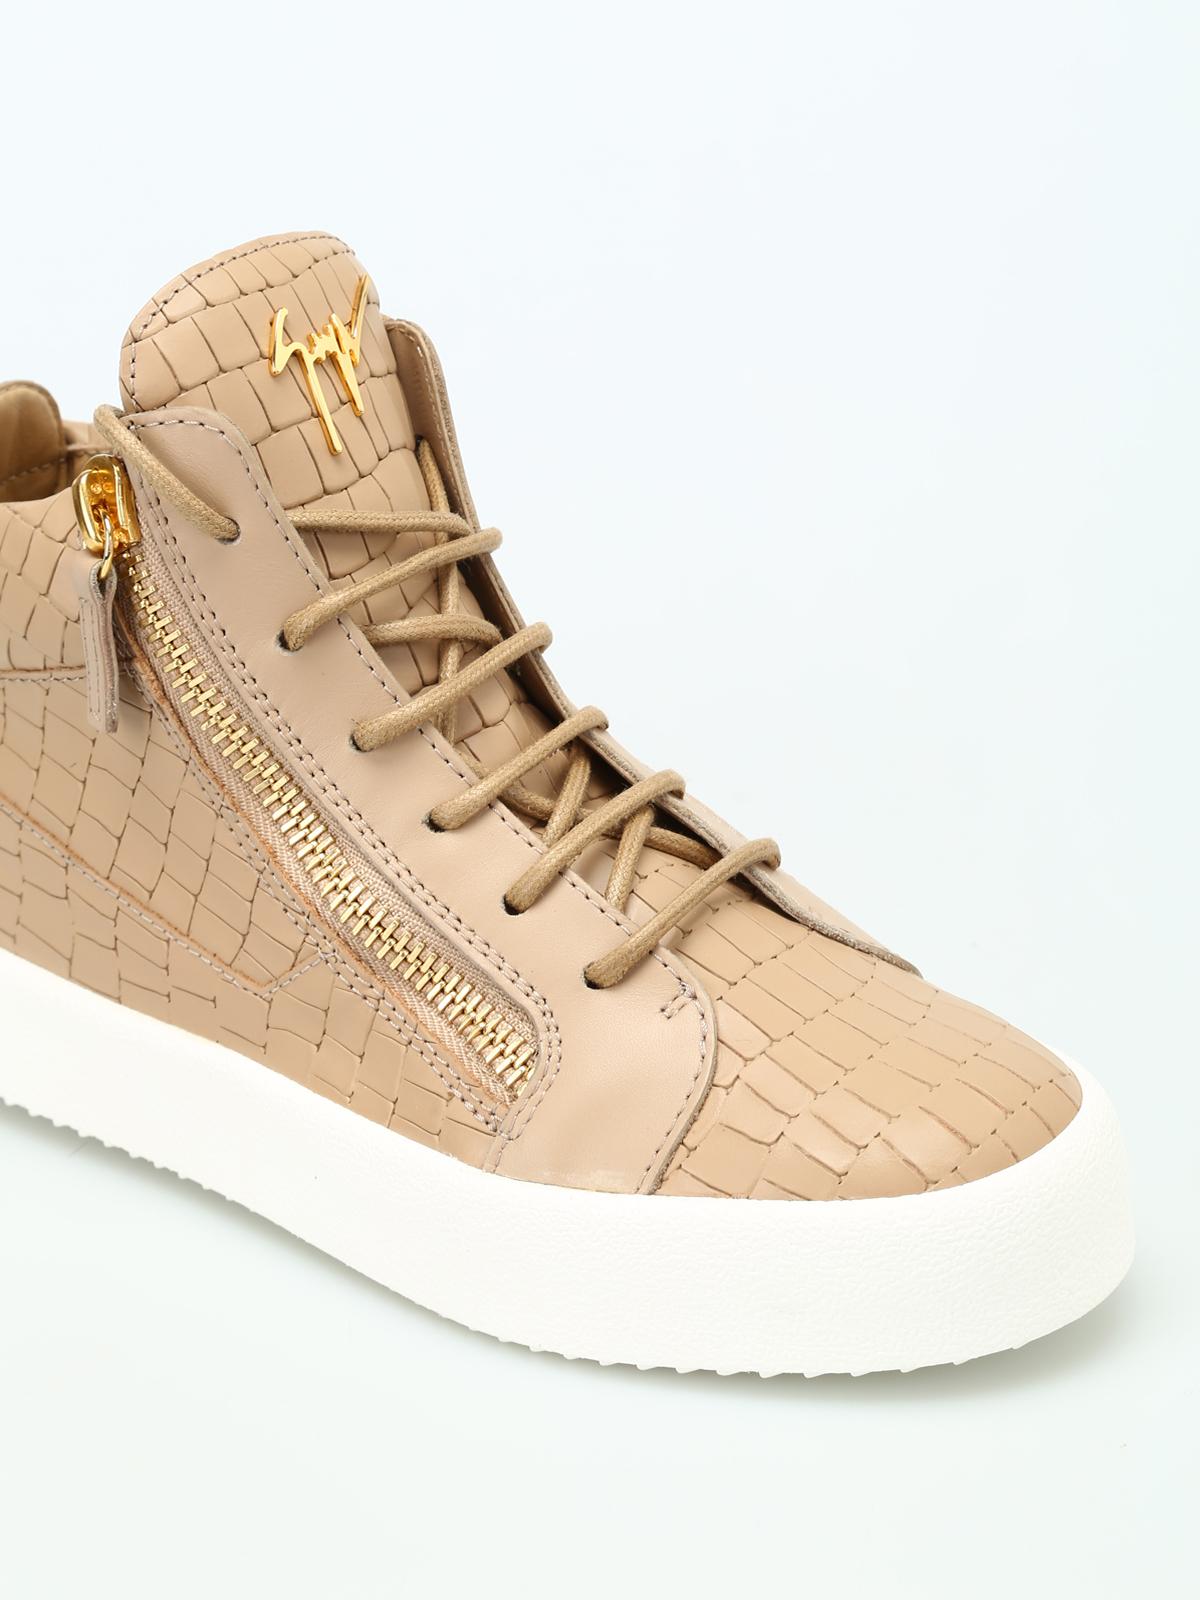 783f5e9d73d06 iKRIX GIUSEPPE ZANOTTI: trainers - May London croco print sneakers